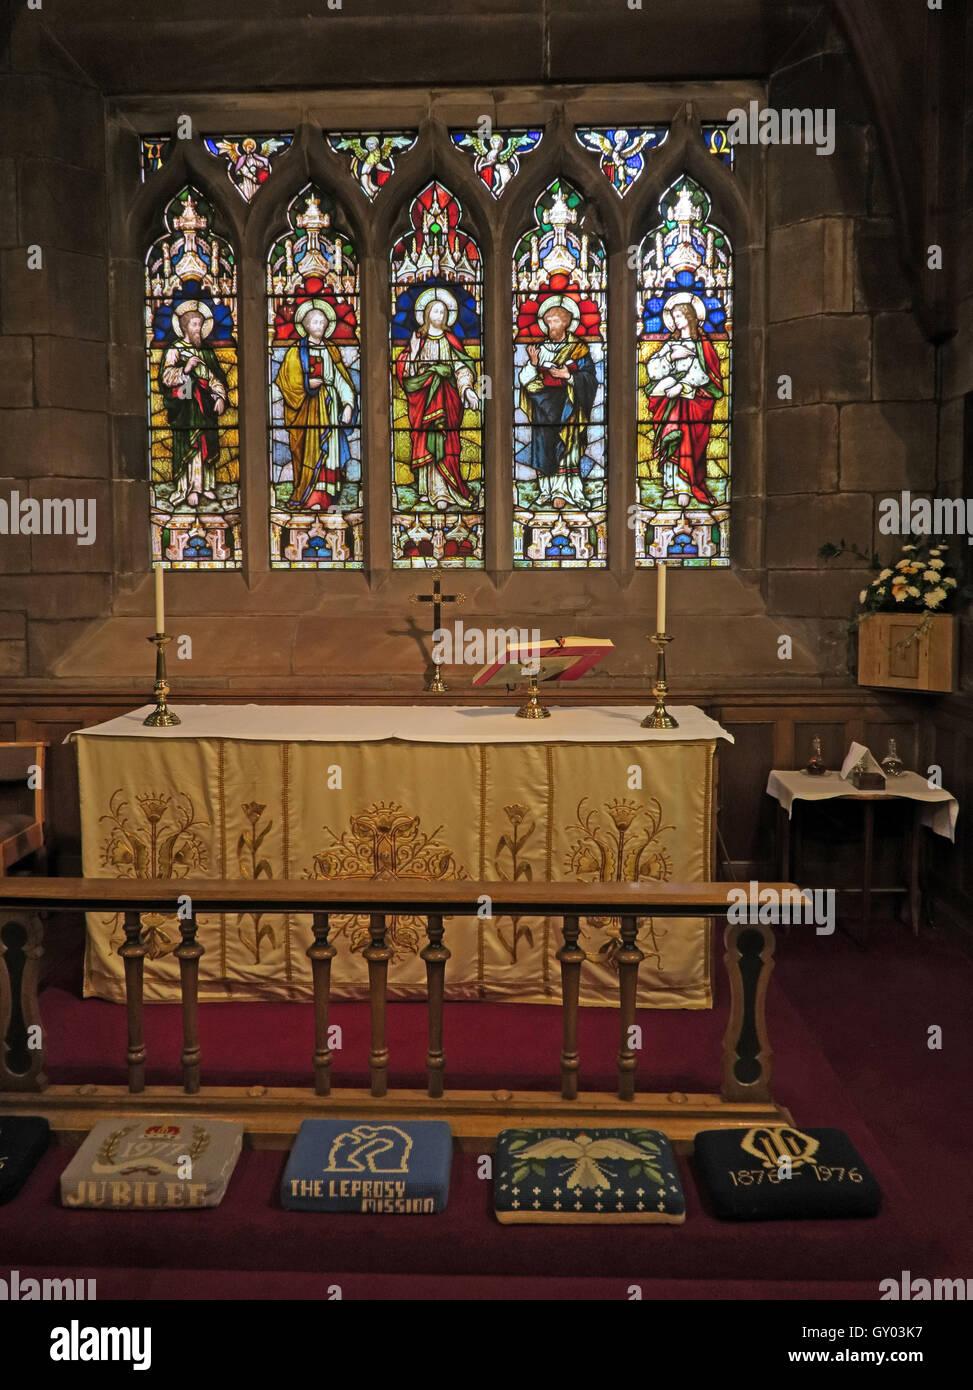 St Wilfrids Church Grappenhall- Lady Chapel Altar,Warrington - Stock Image